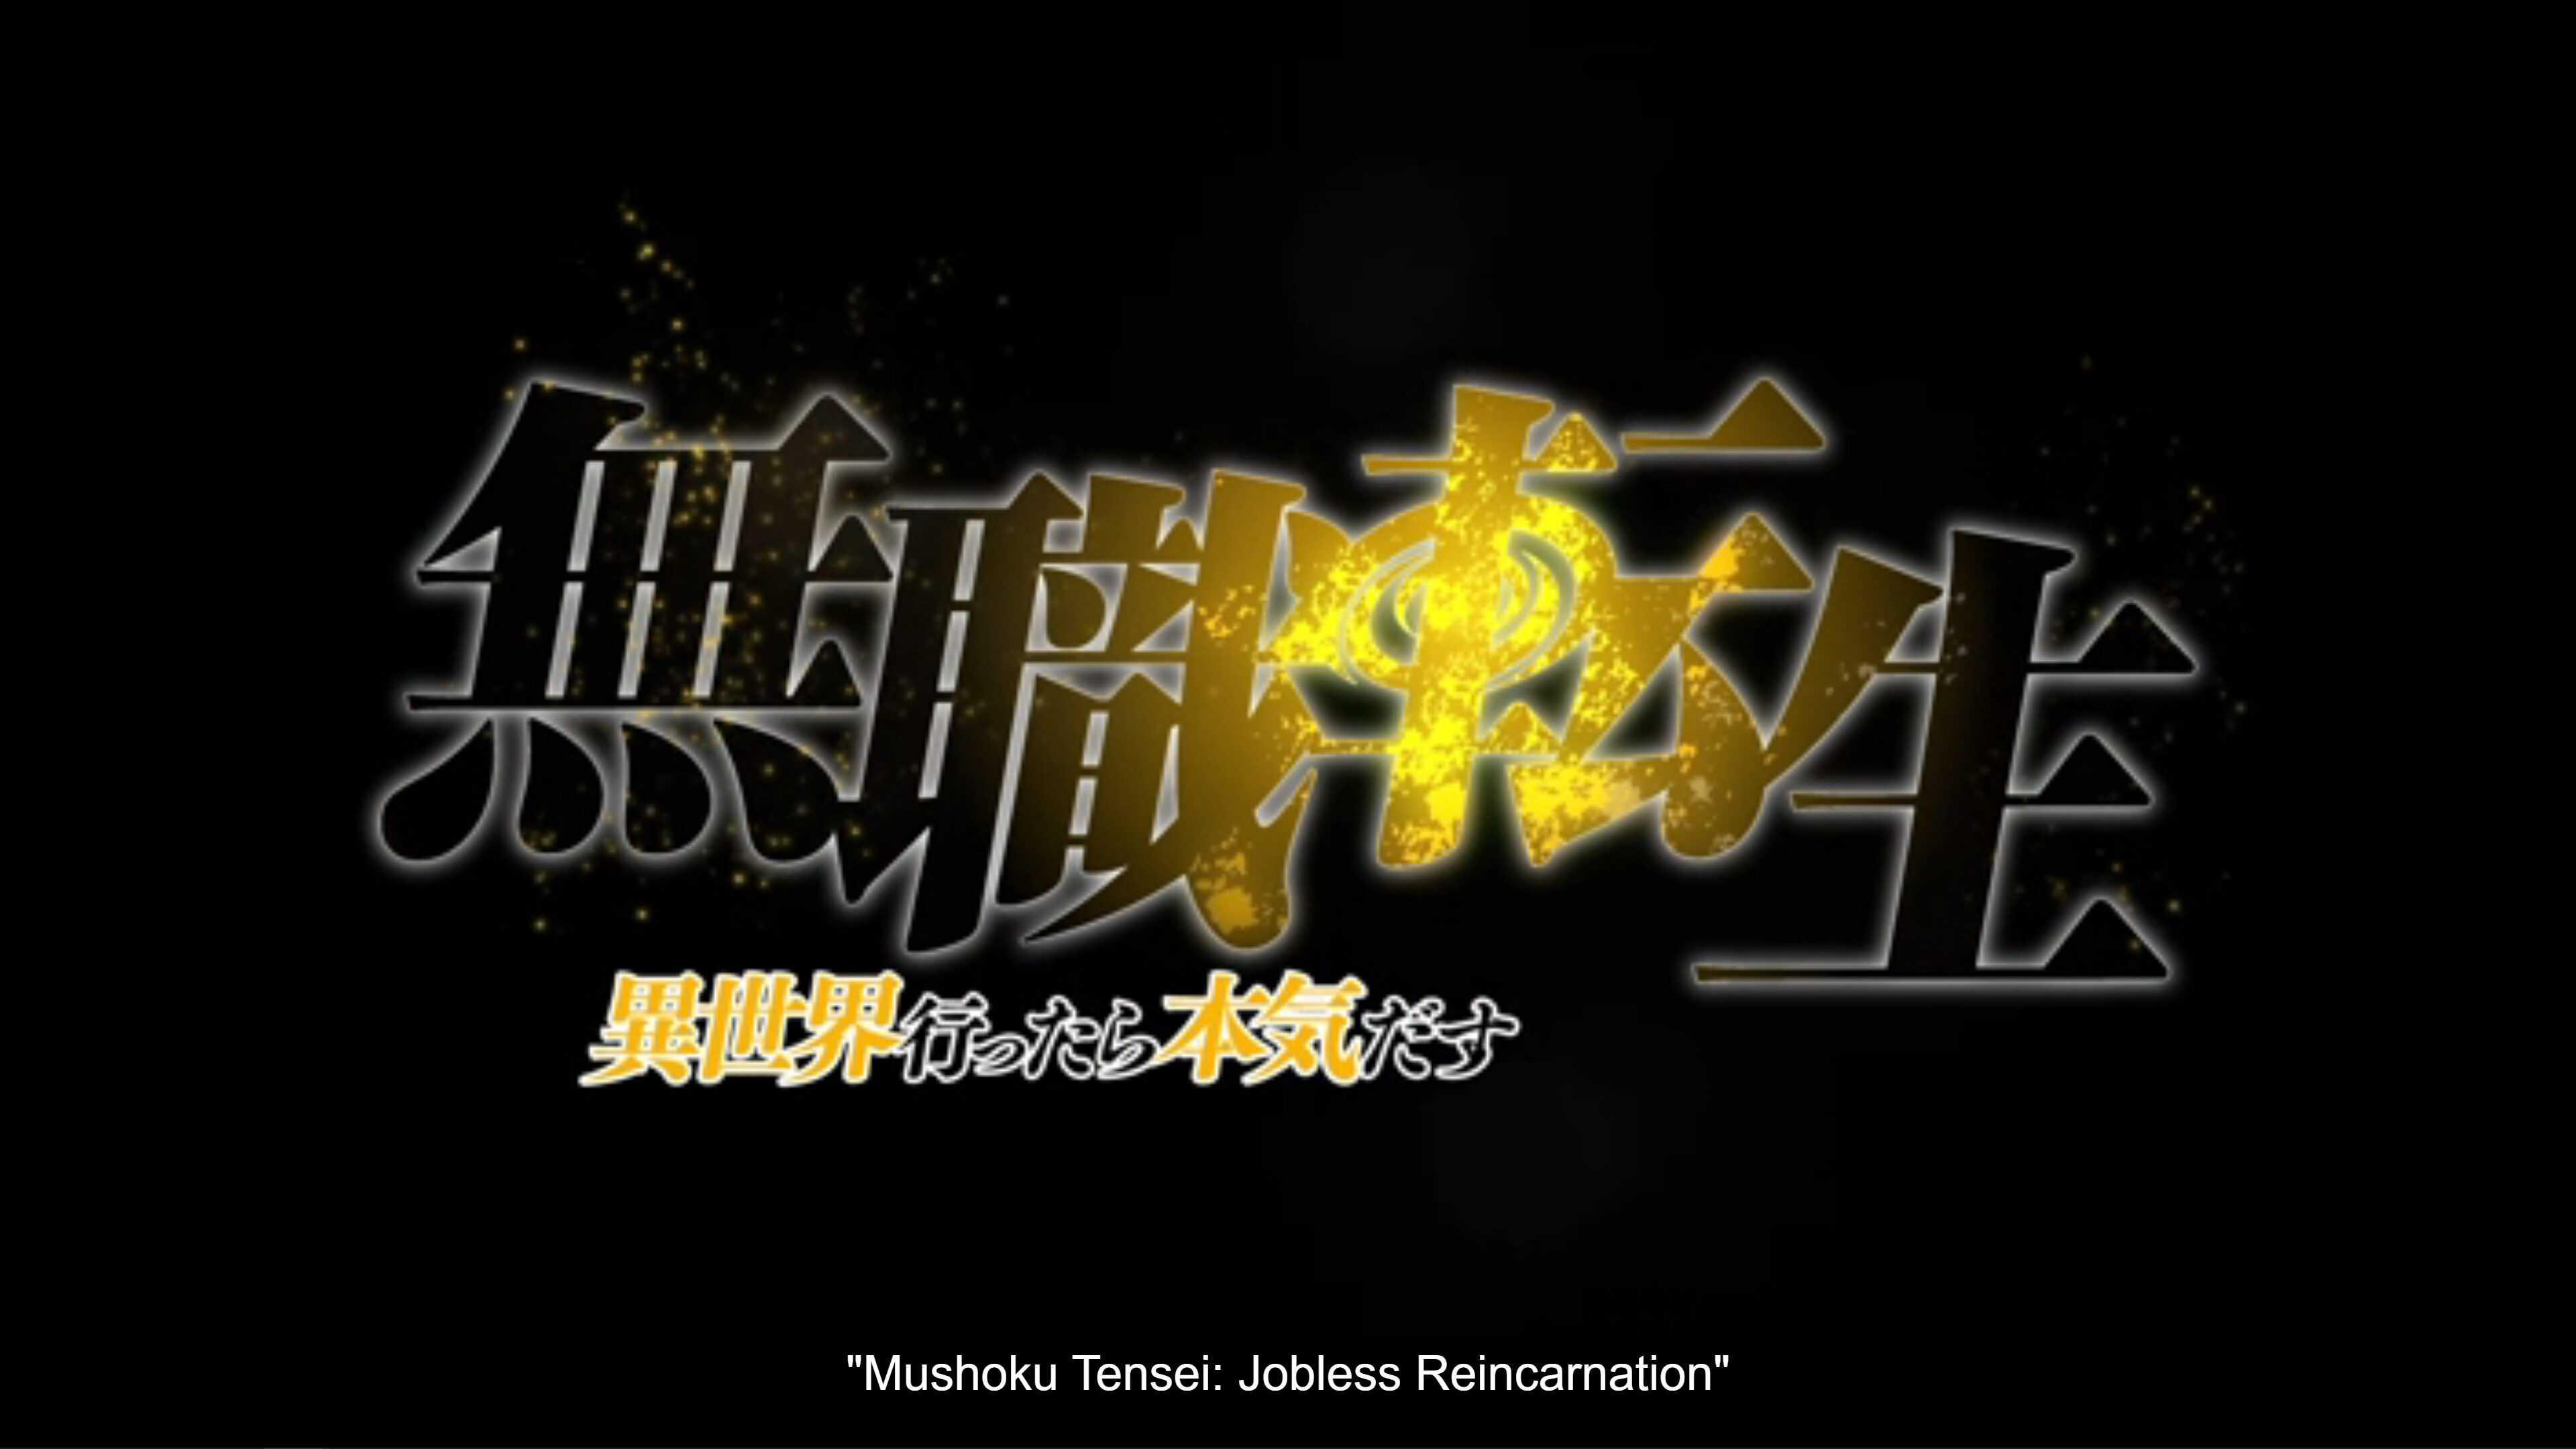 Title Card - Mushoku Tensei Jobless Reincarnation Season 1 Episode 1 Jobless Reincarnation [Series Premiere]